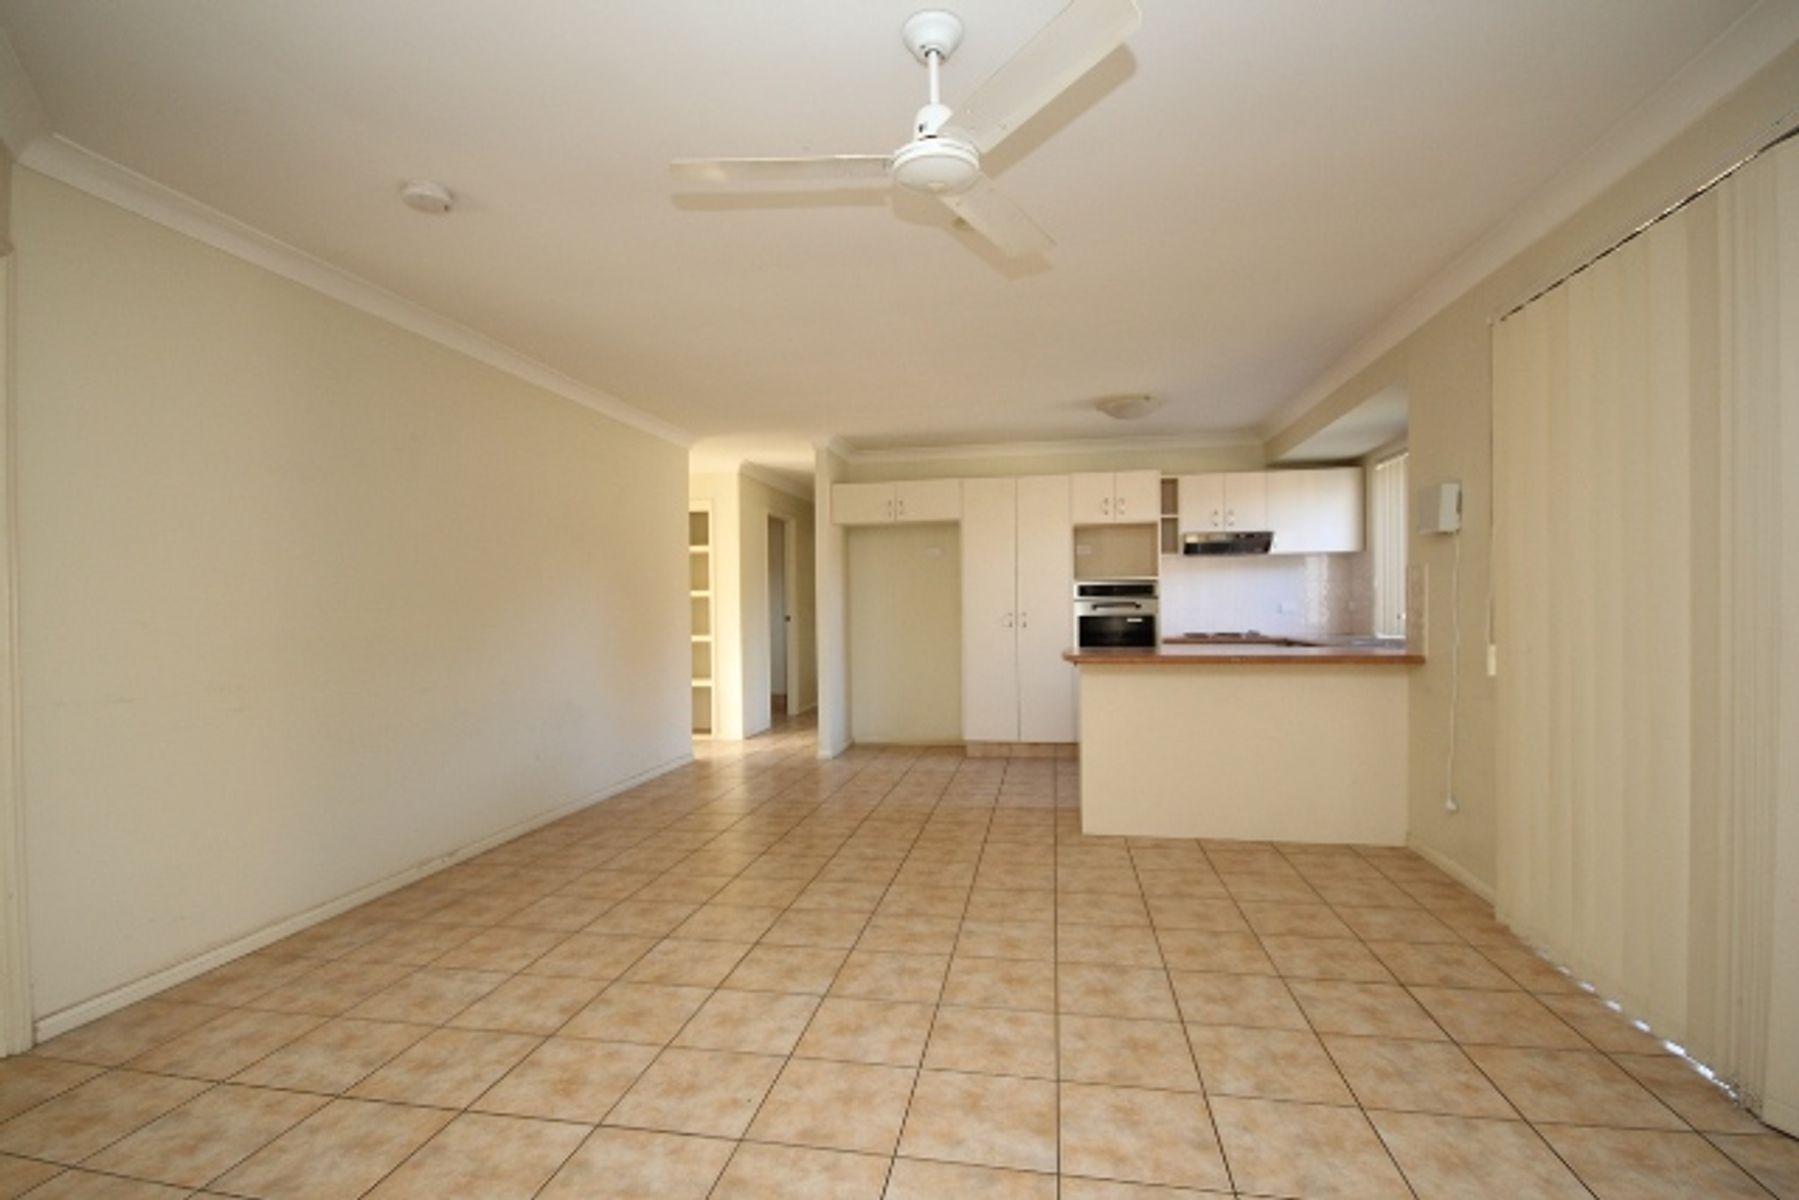 25 Tiber Crescent, Springfield, QLD 4300